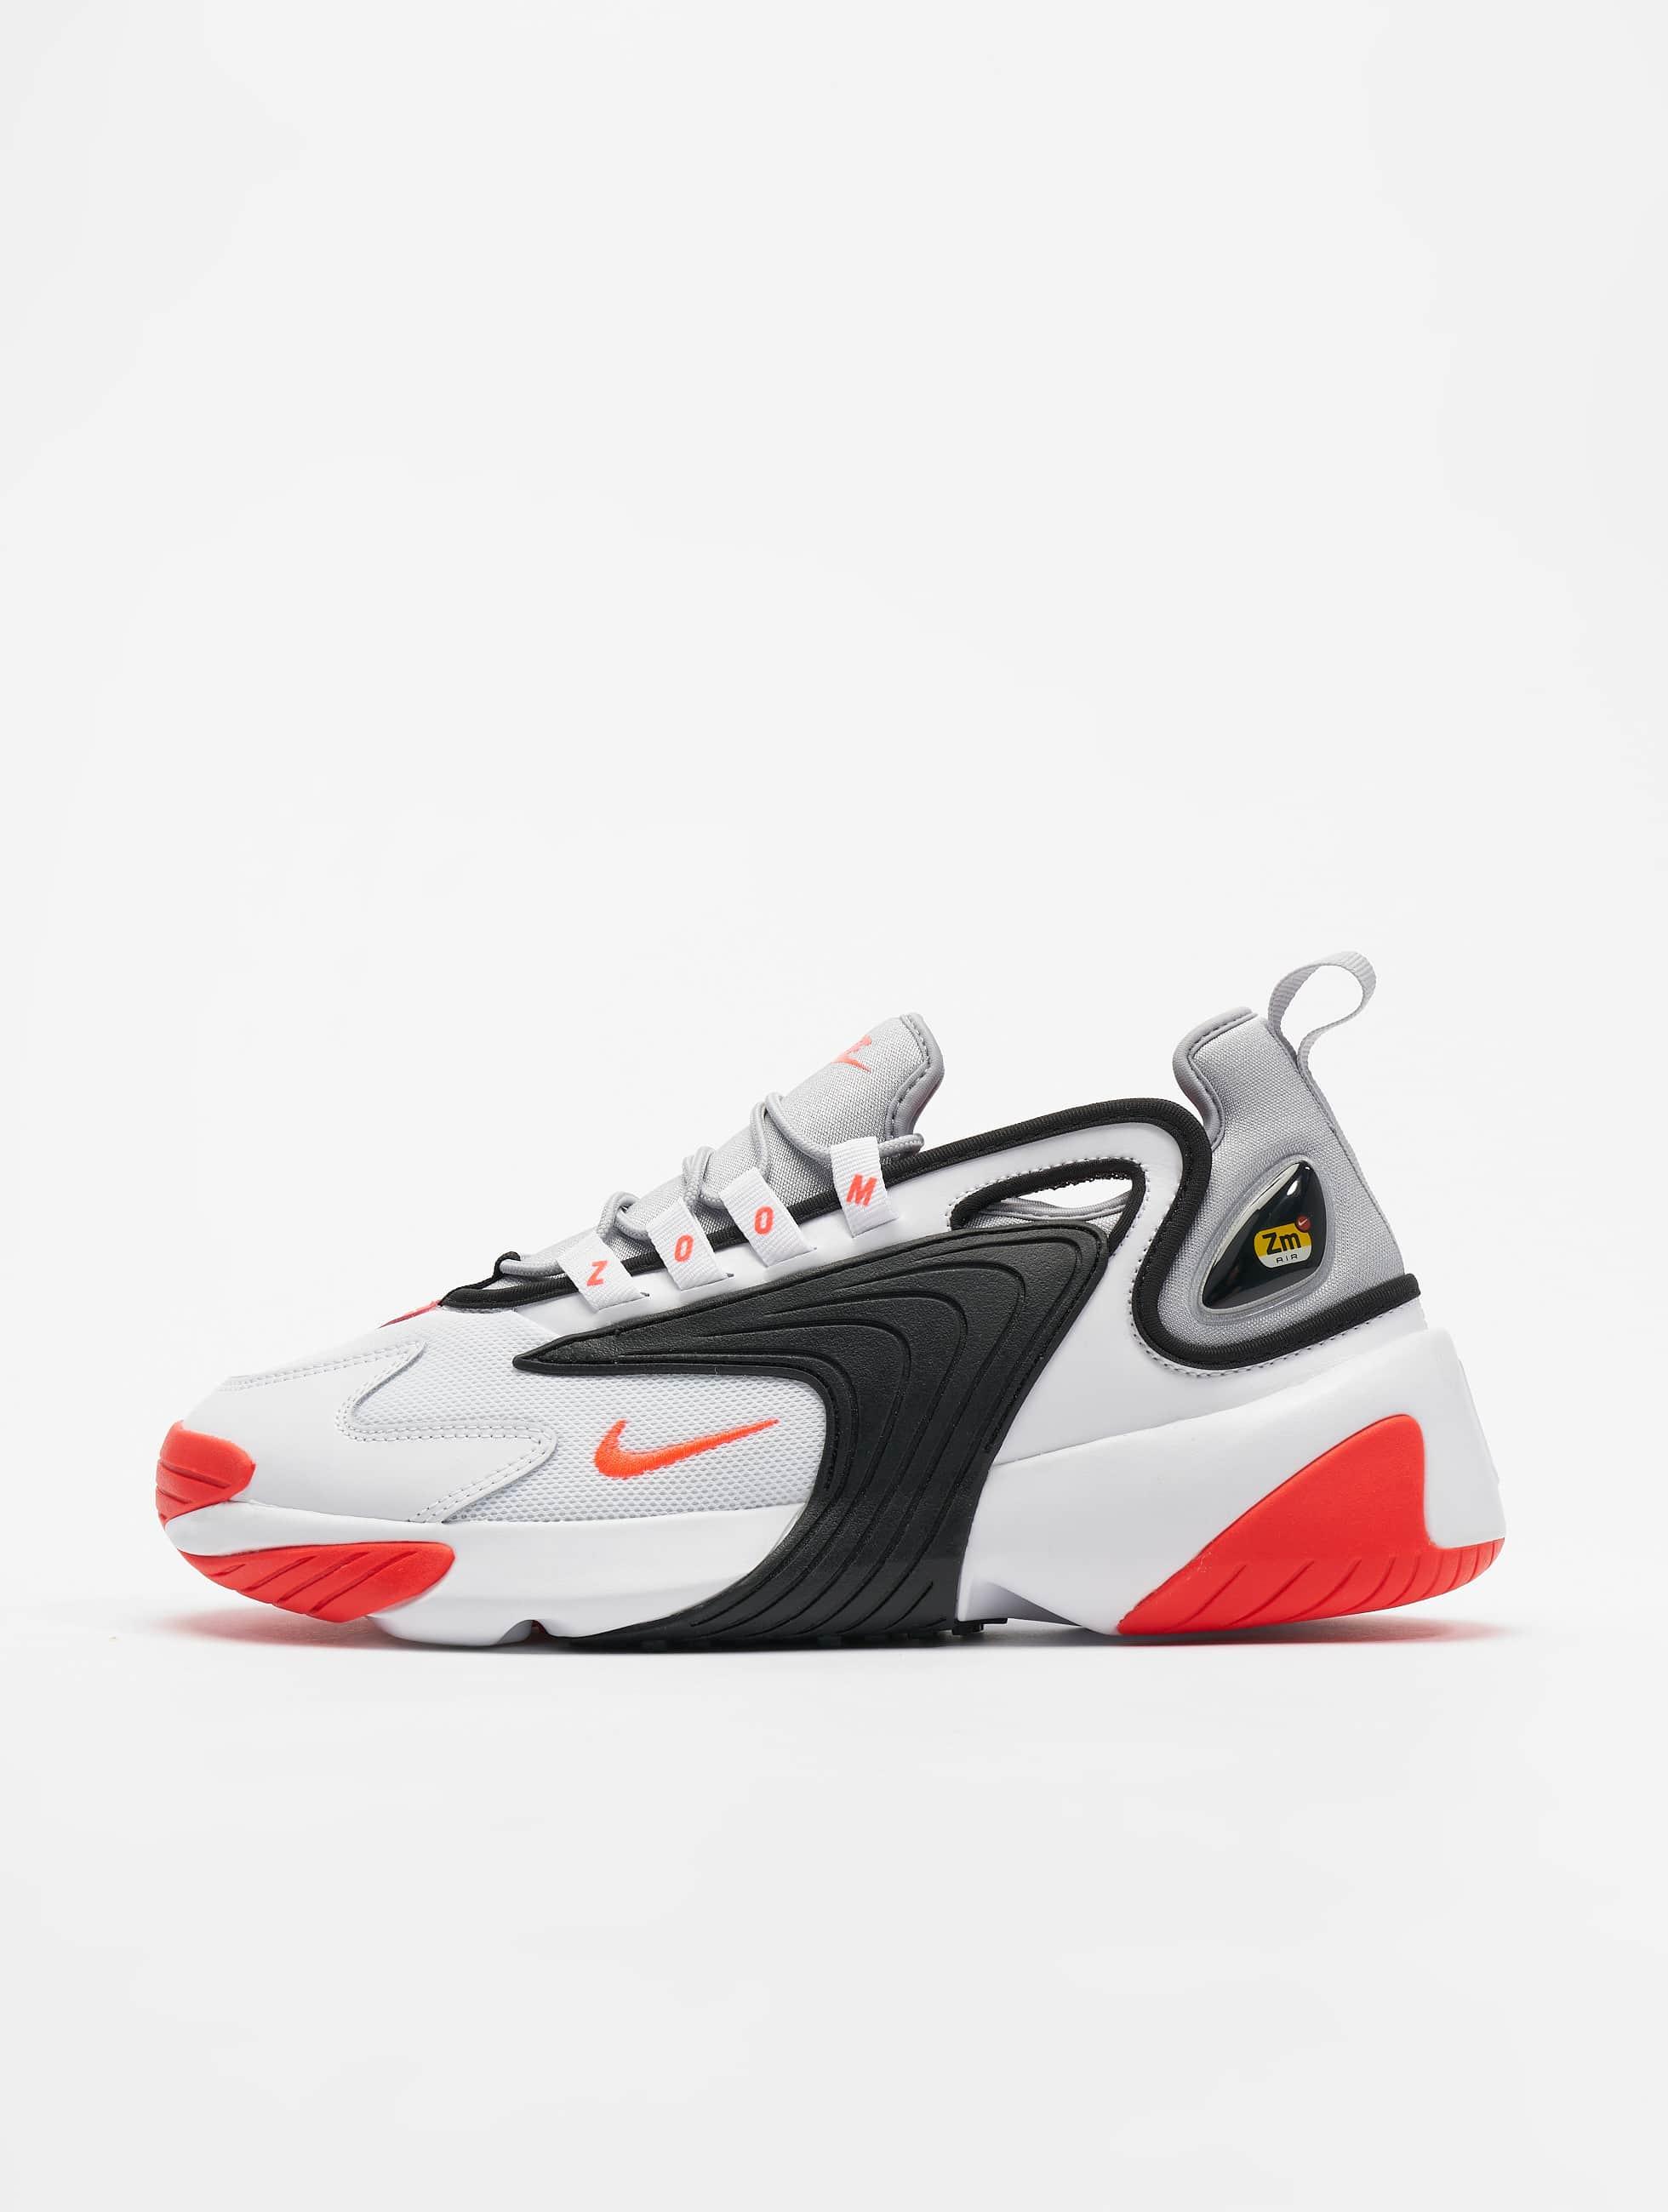 Nike Zoom 2K Sneakers WhiteInfrared 23Wolf GreyBlack